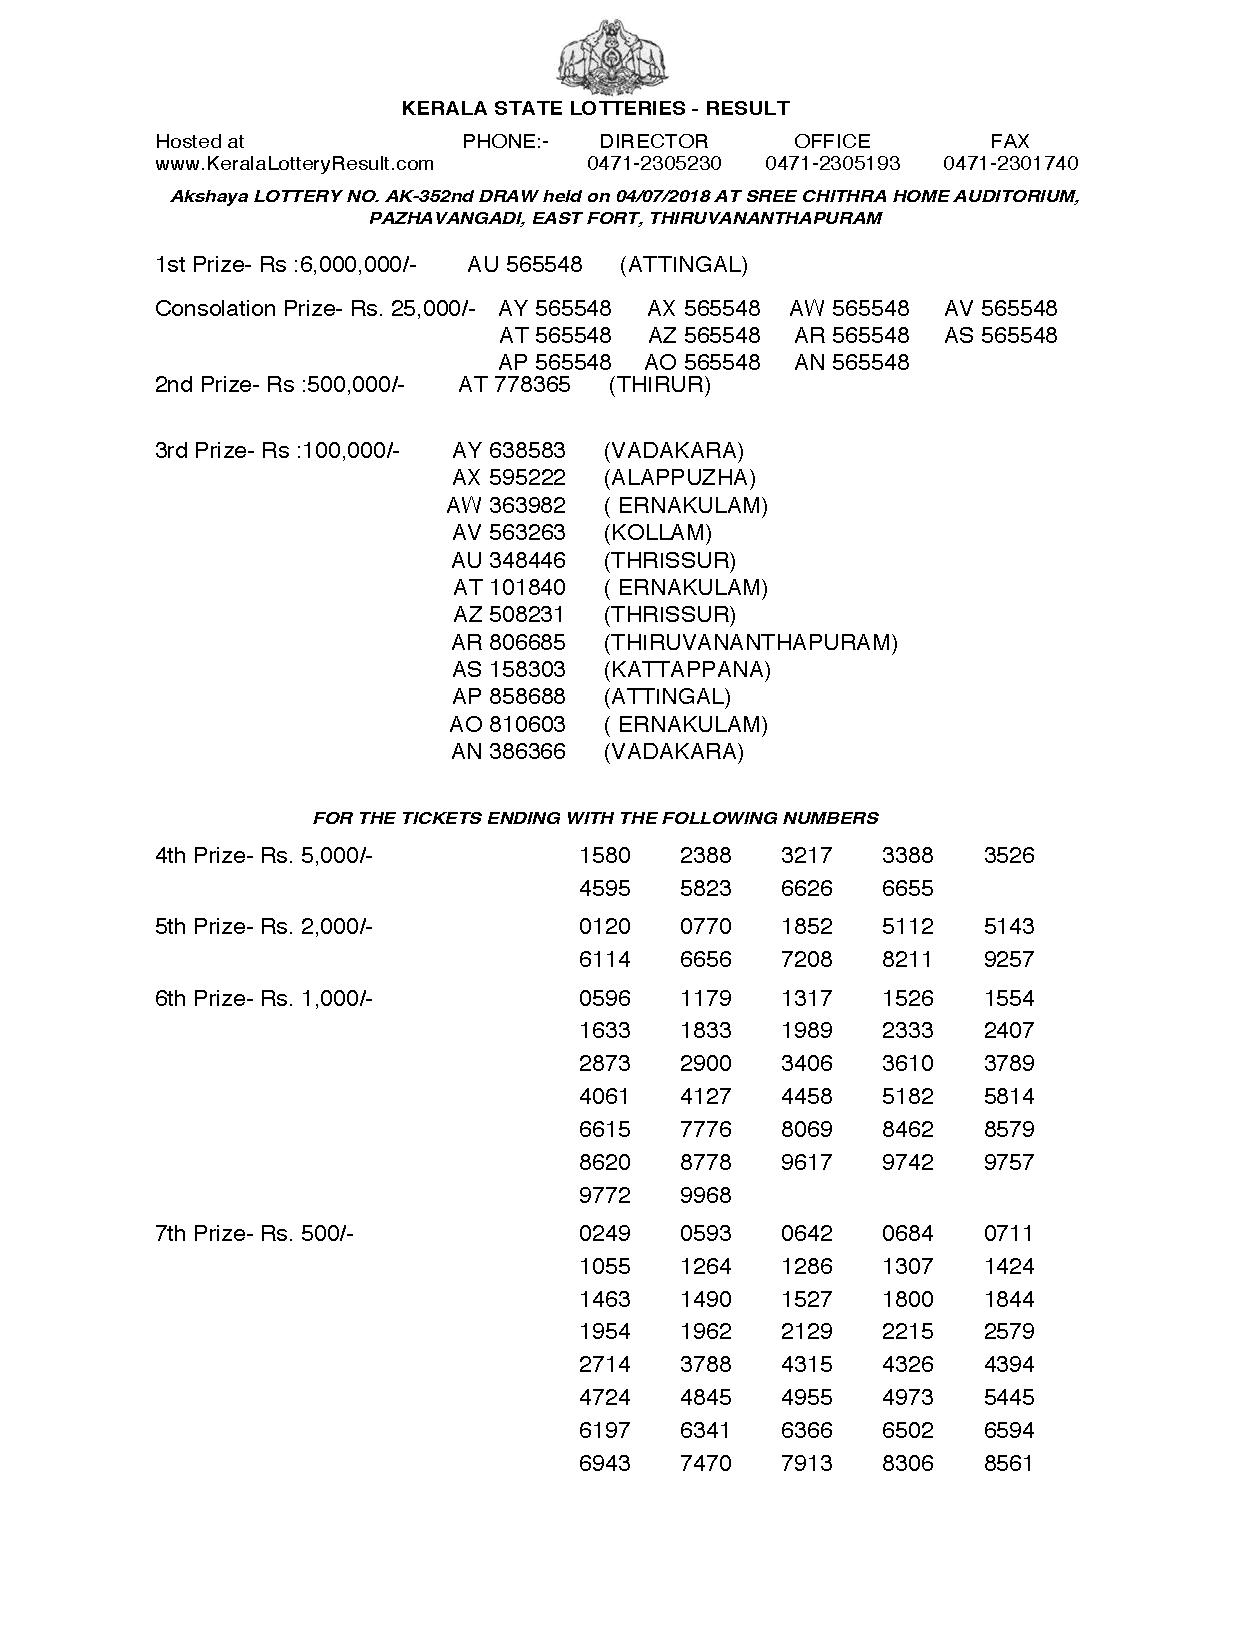 Akshaya AK352 Kerala Lottery Results Screenshot: Page 1